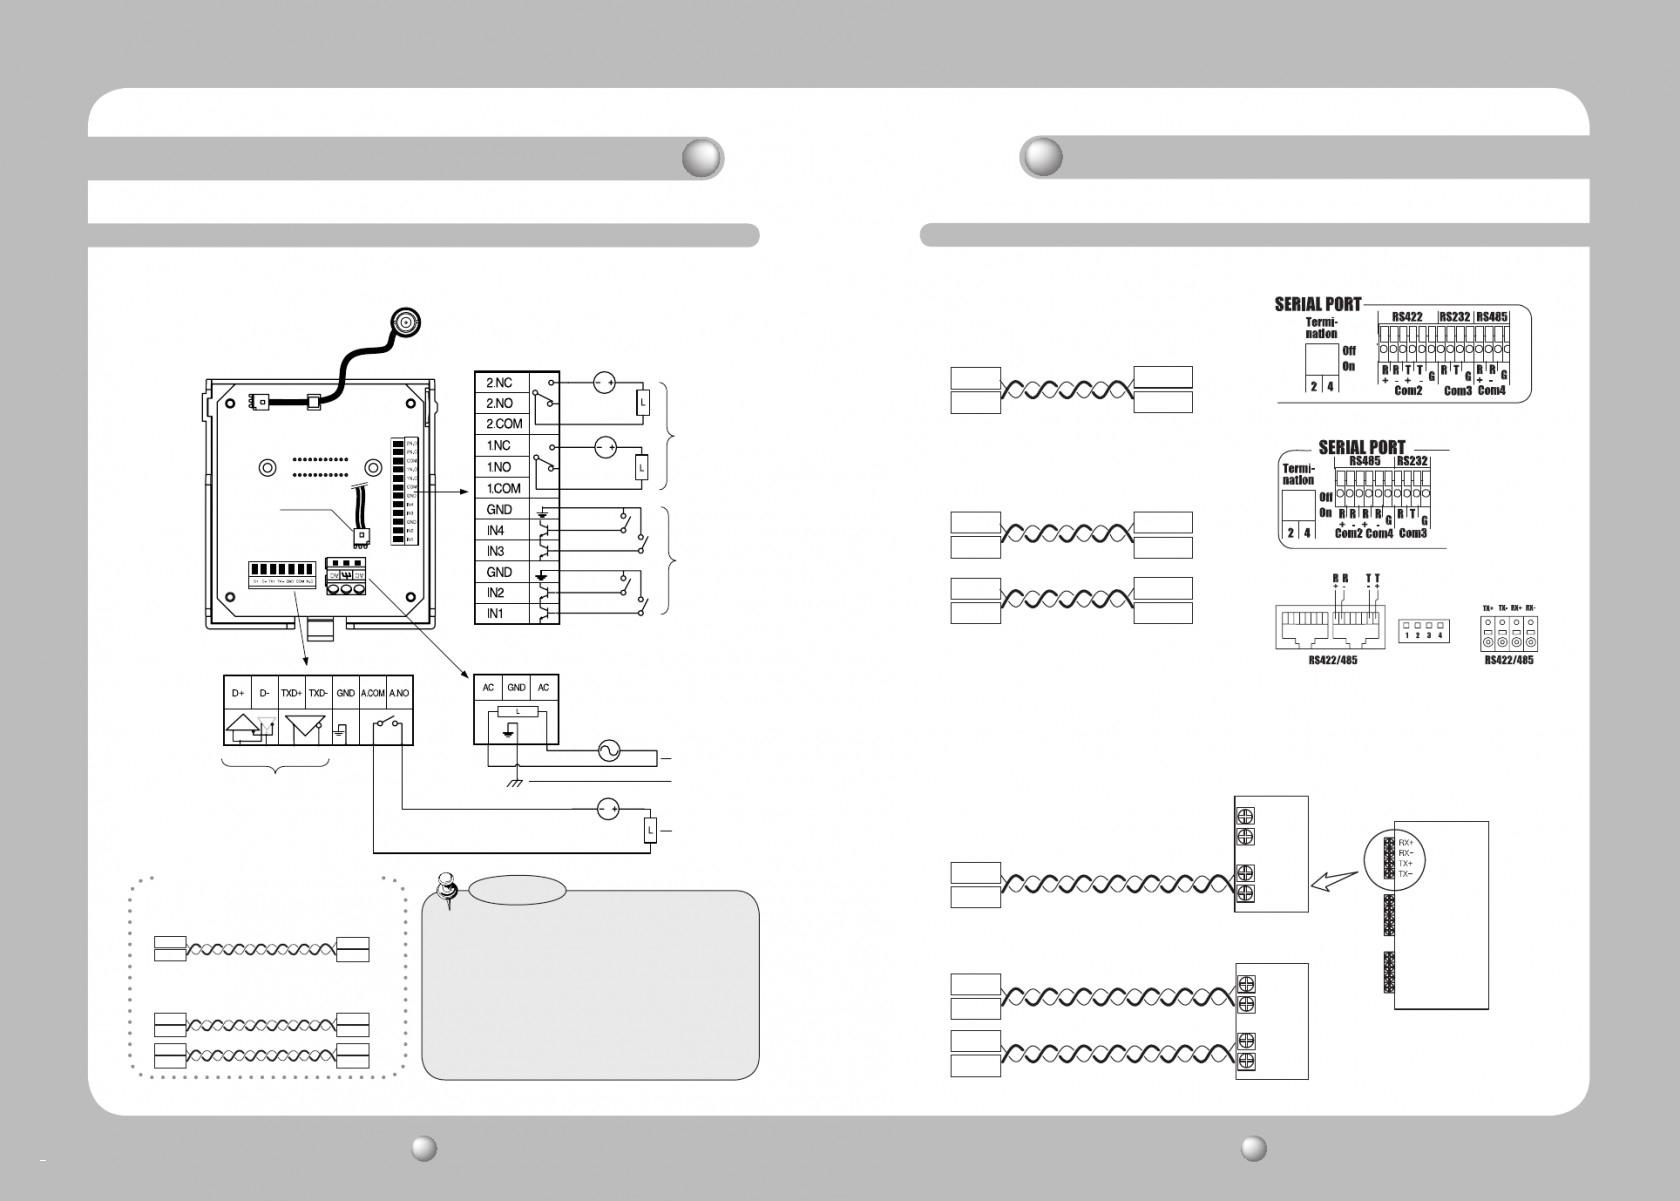 samsung security camera wiring diagram Download-Bunker Hill Security Camera Wiring Diagram Unique Bunker Hill Security Camera Wiring Diagram Inspiration Worker Resume 10-j